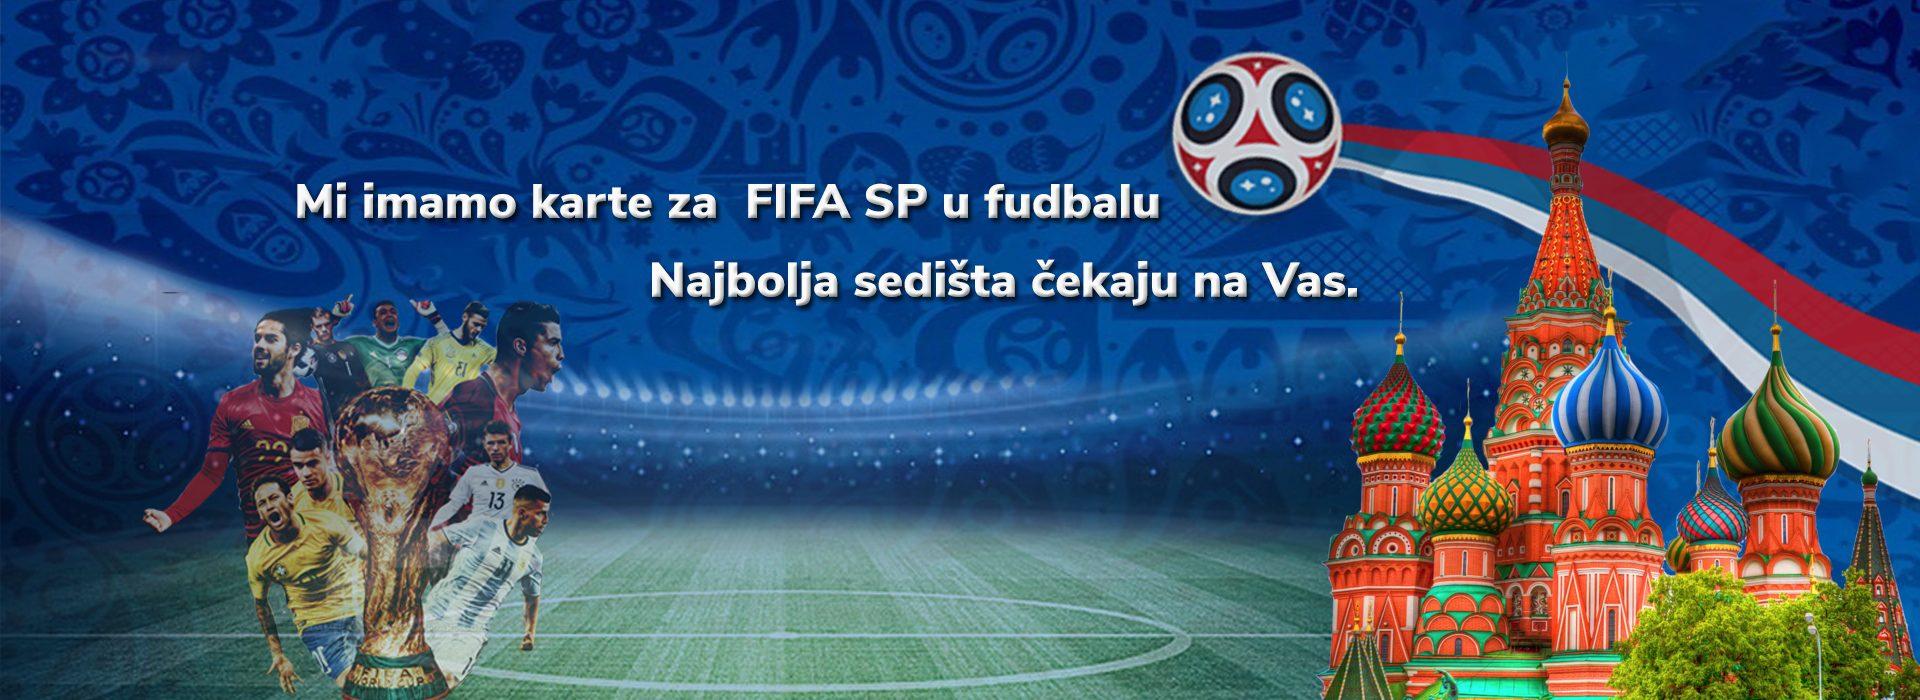 FIFA SP  Rusija 2018